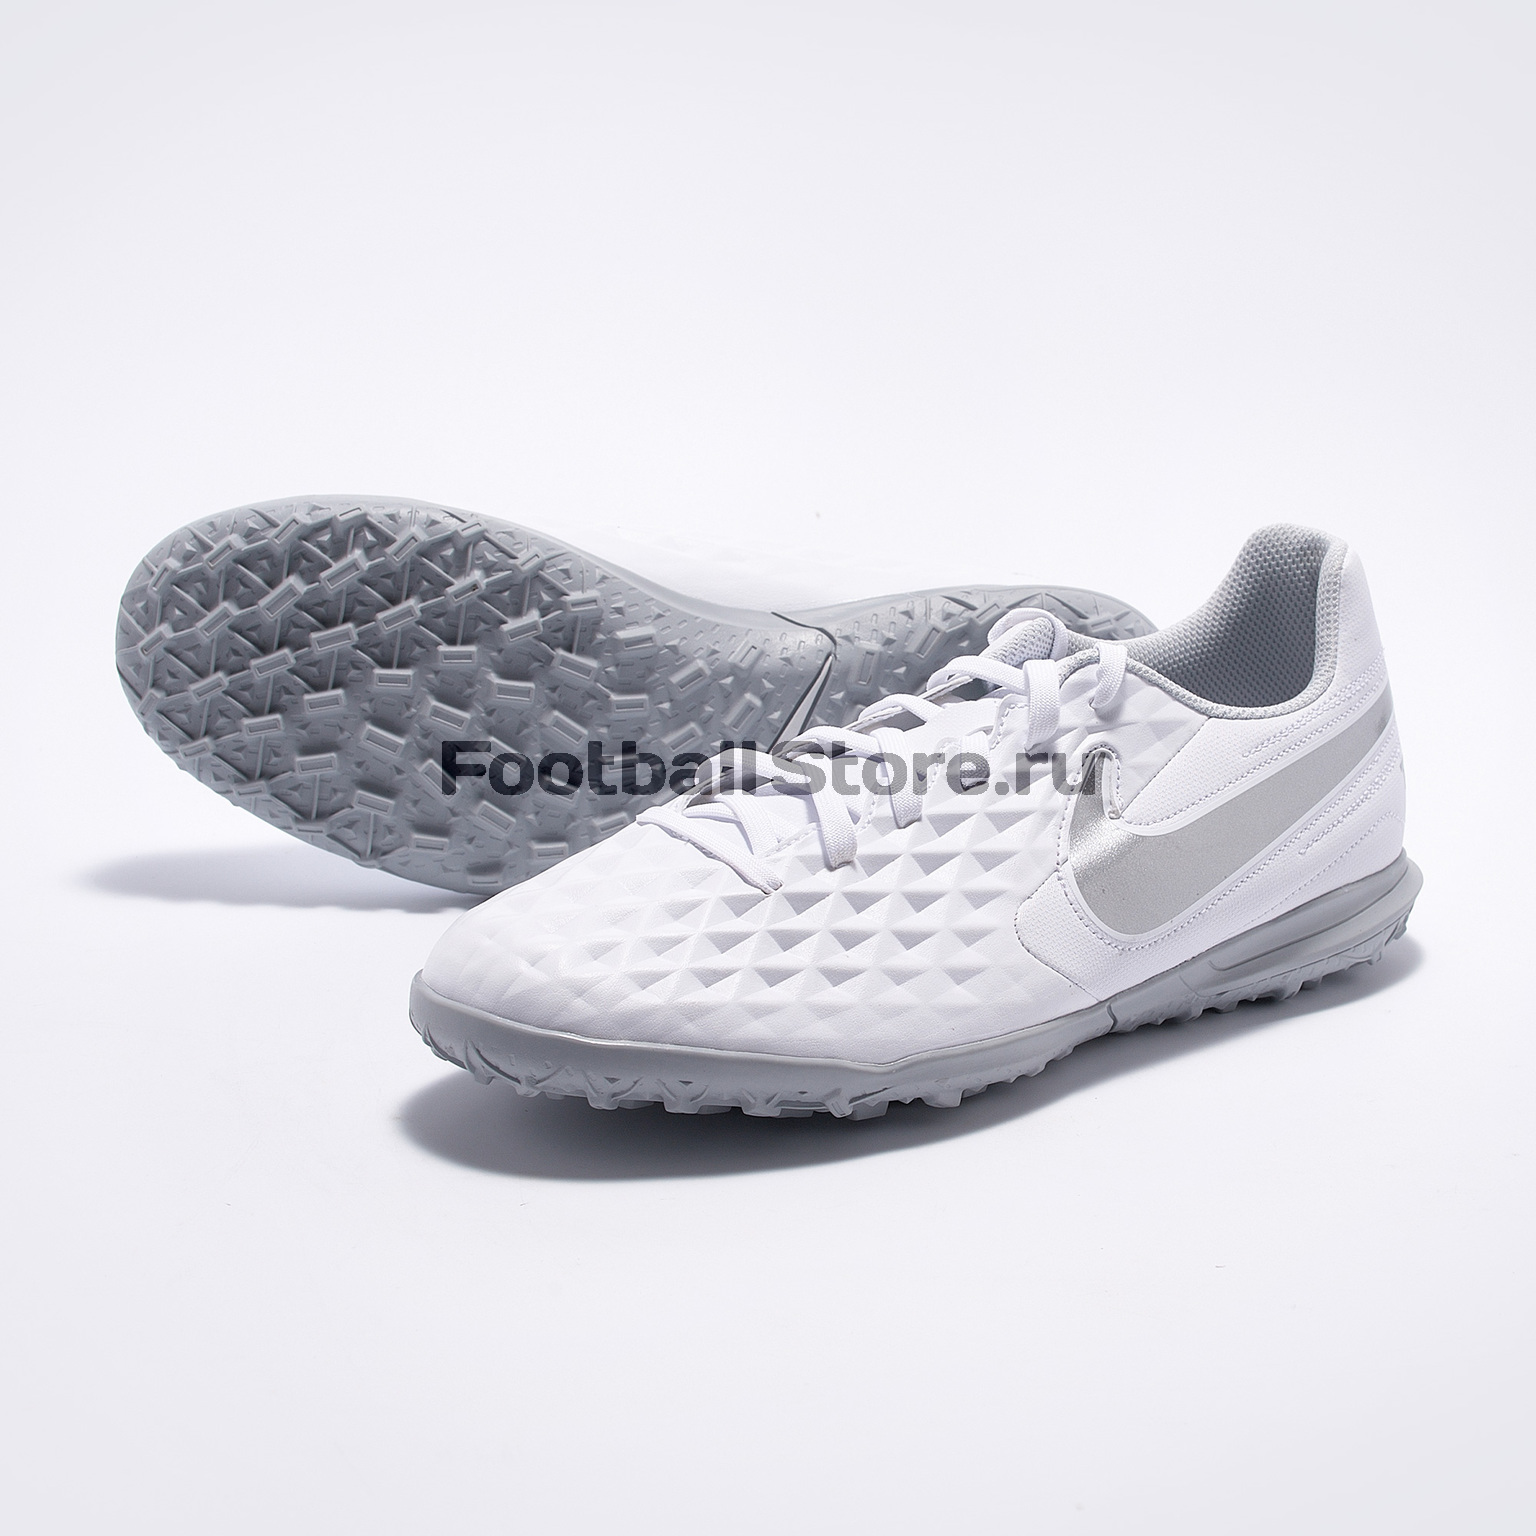 цены на Шиповки Nike Legend 8 Club TF AT6109-100  в интернет-магазинах